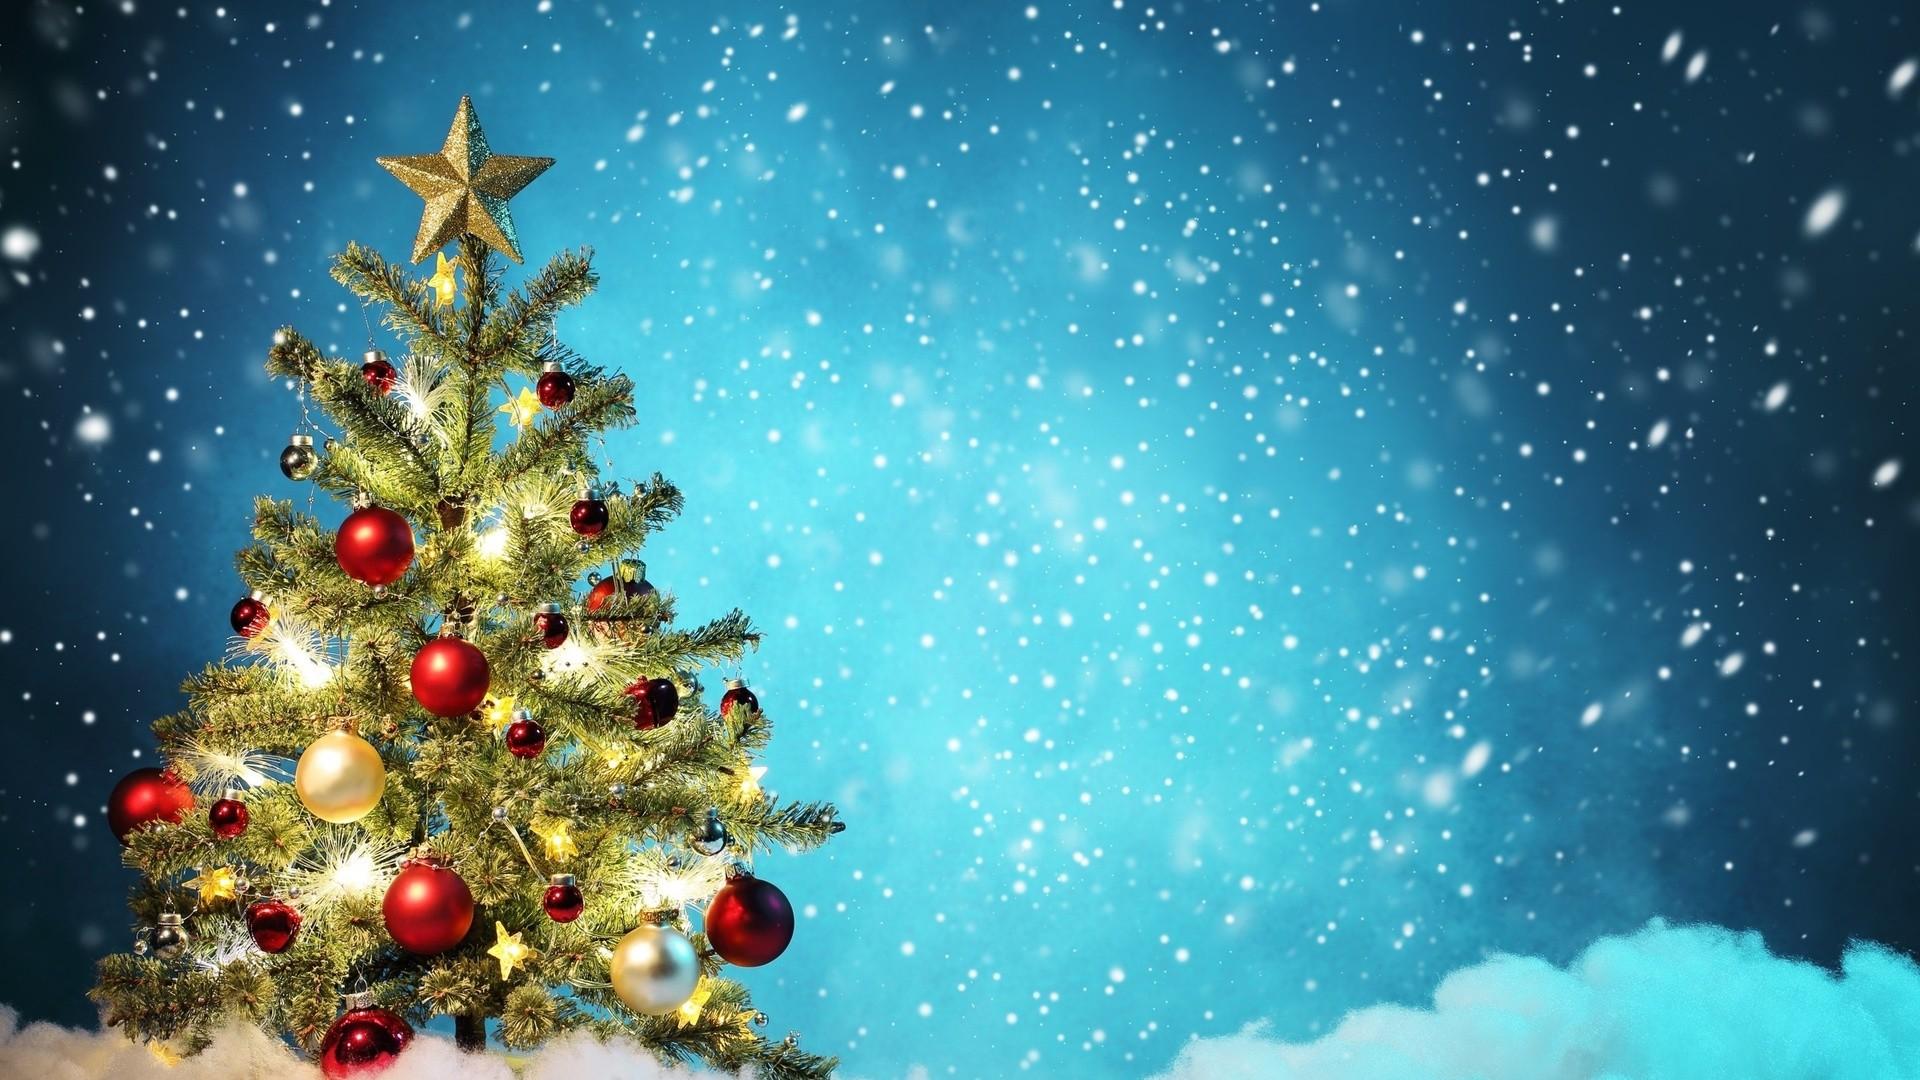 Christmas tree wallpapers (19 Wallpapers)